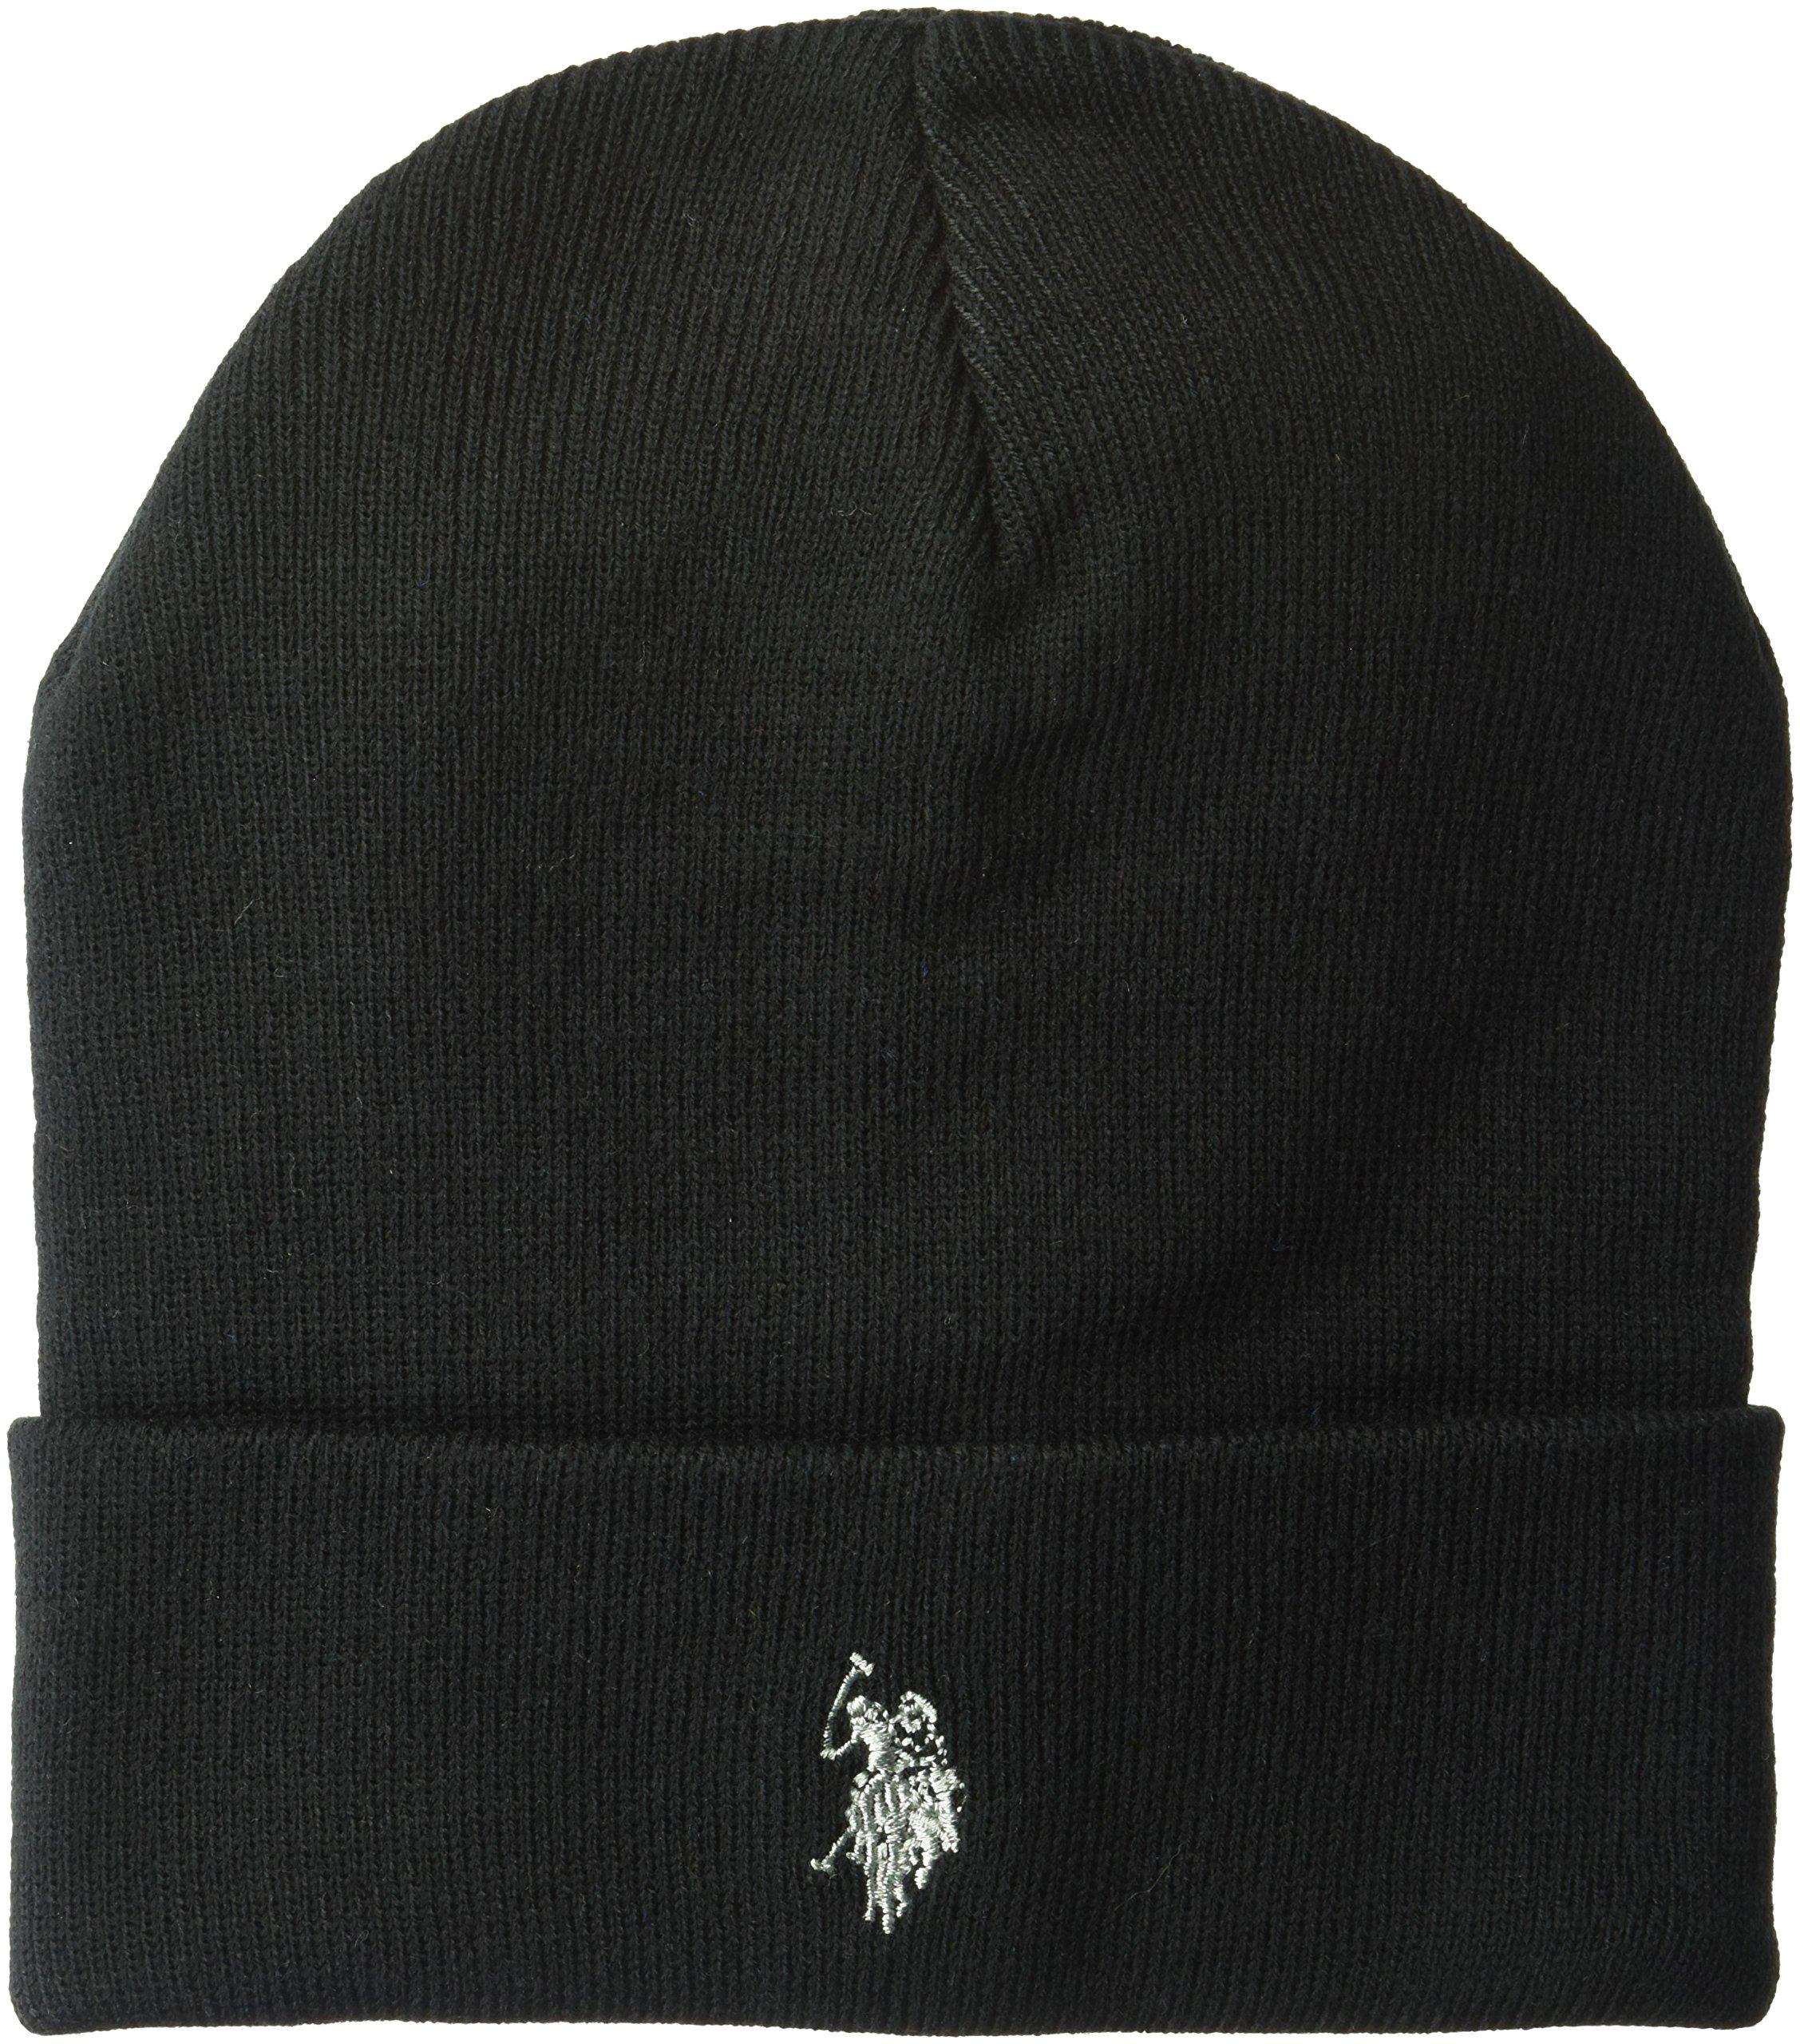 U.S. Polo Assn. Men's Fine Knit Cuffed Winter Beanie, 100% Acrylic, Black, One Size